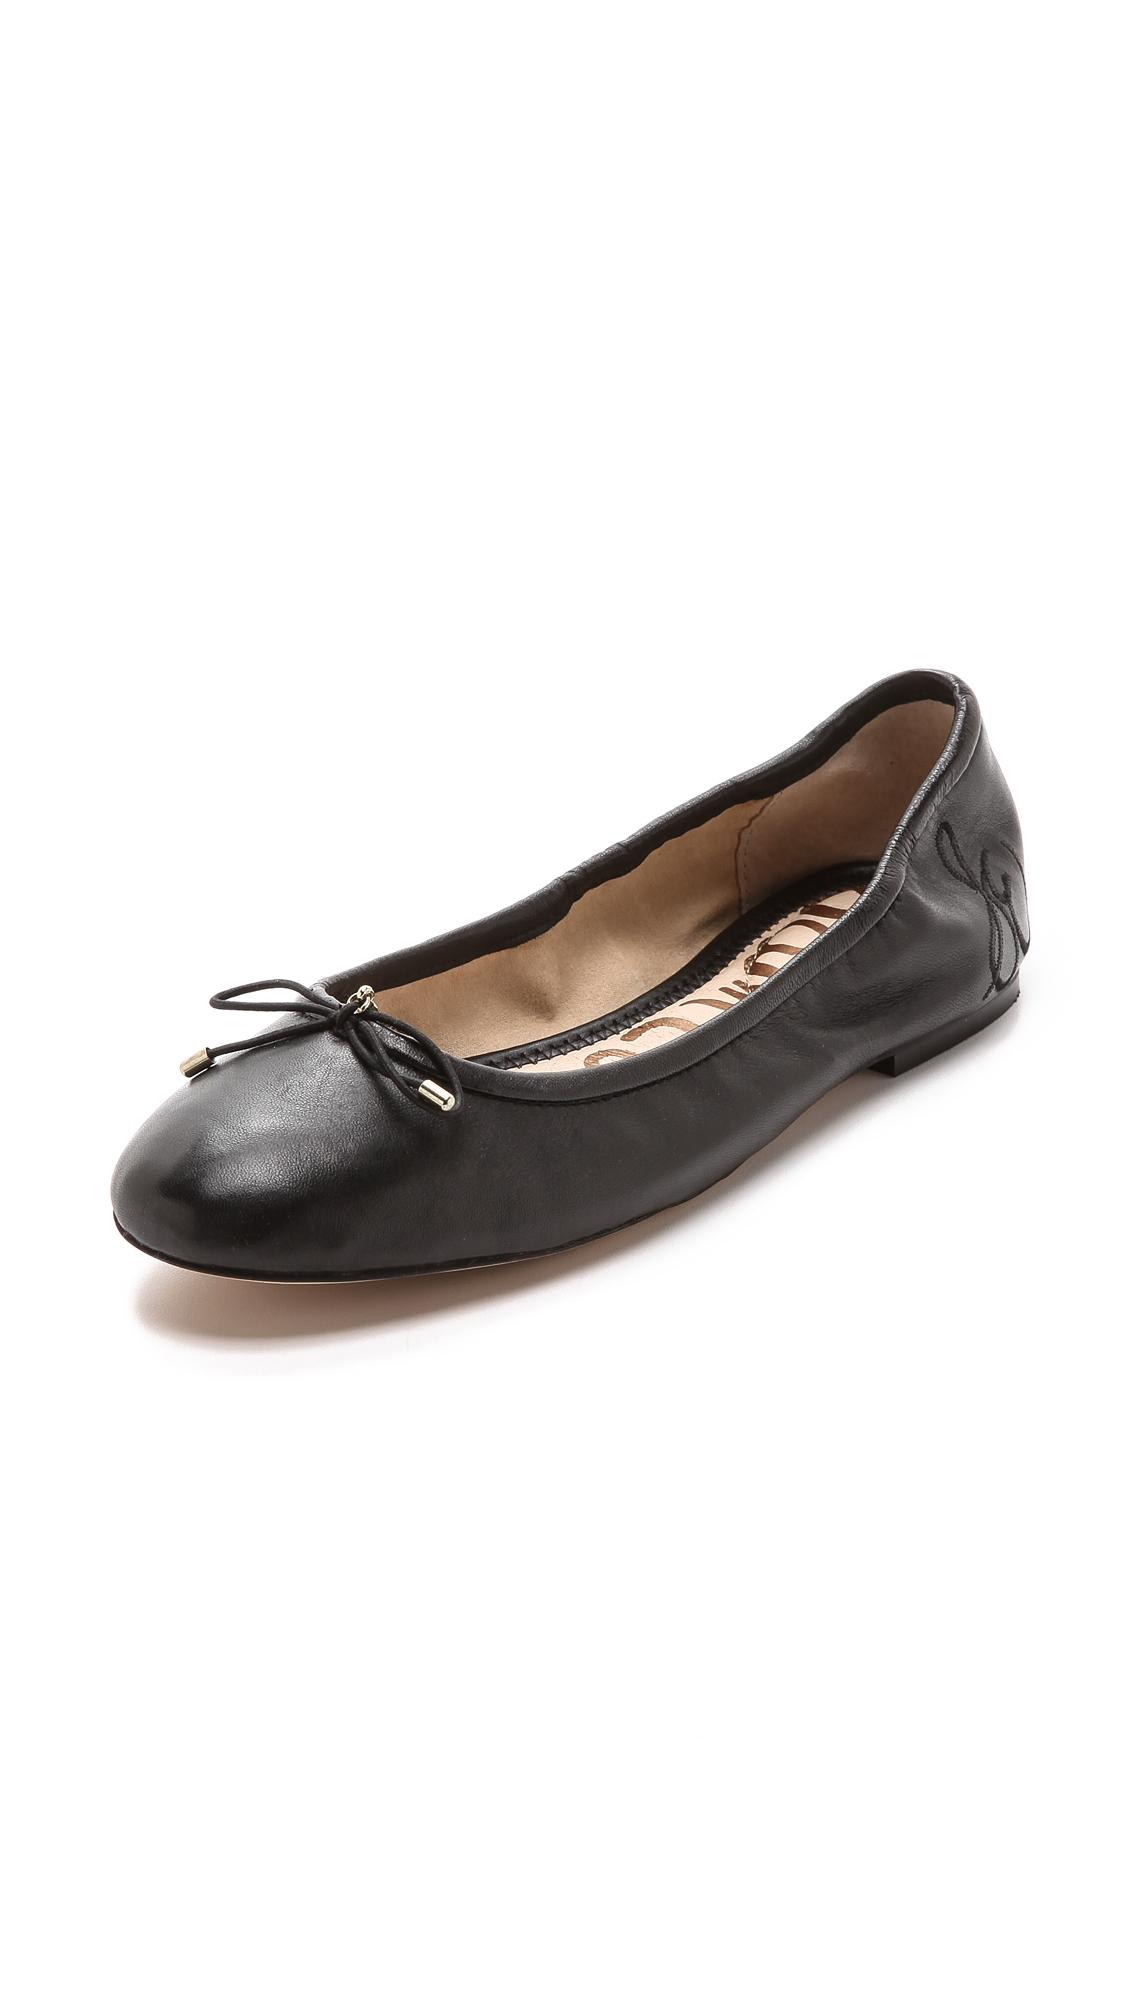 222a3186405c SAM EDELMAN 'Felicia' Leather Junior Ballerina Flats in Black. Sam Edelman